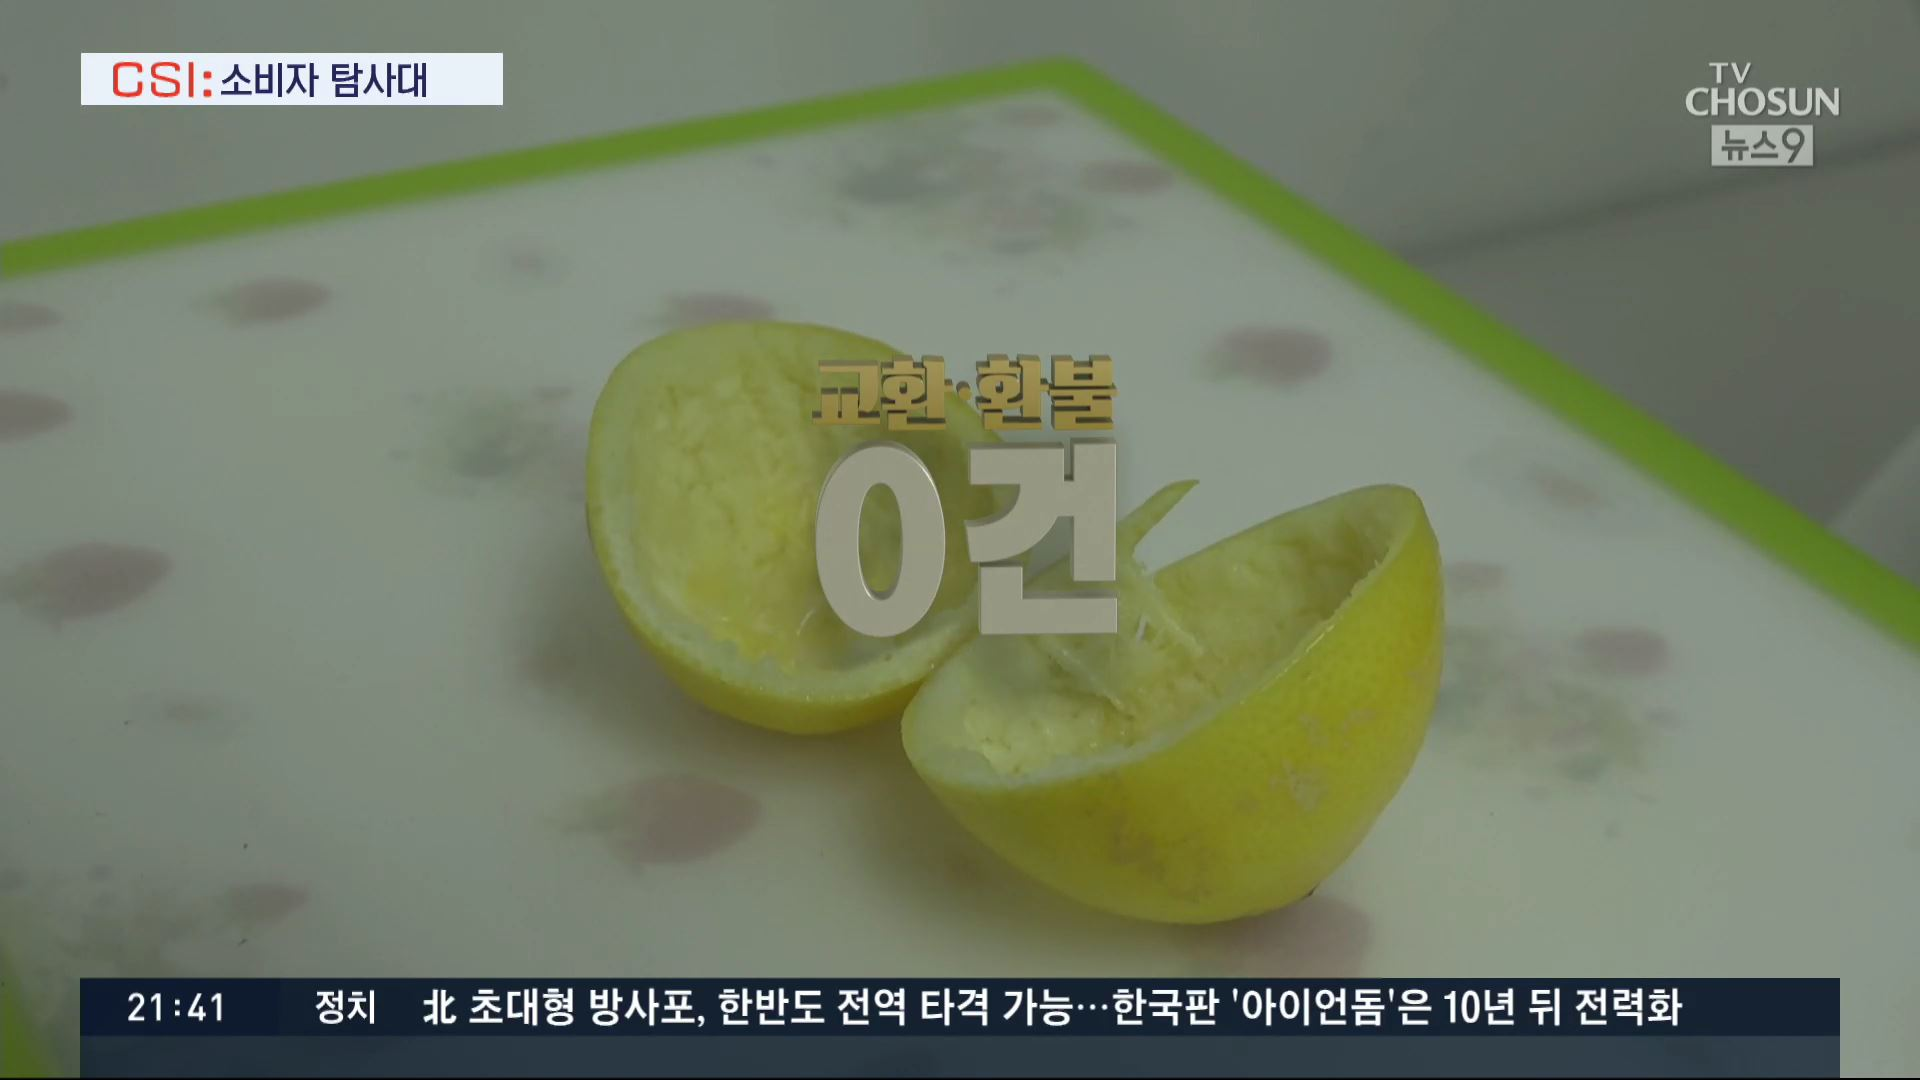 [CSI] '신차 결함 반복돼도 안바꿔줘'…레몬법 2년 교환 0건